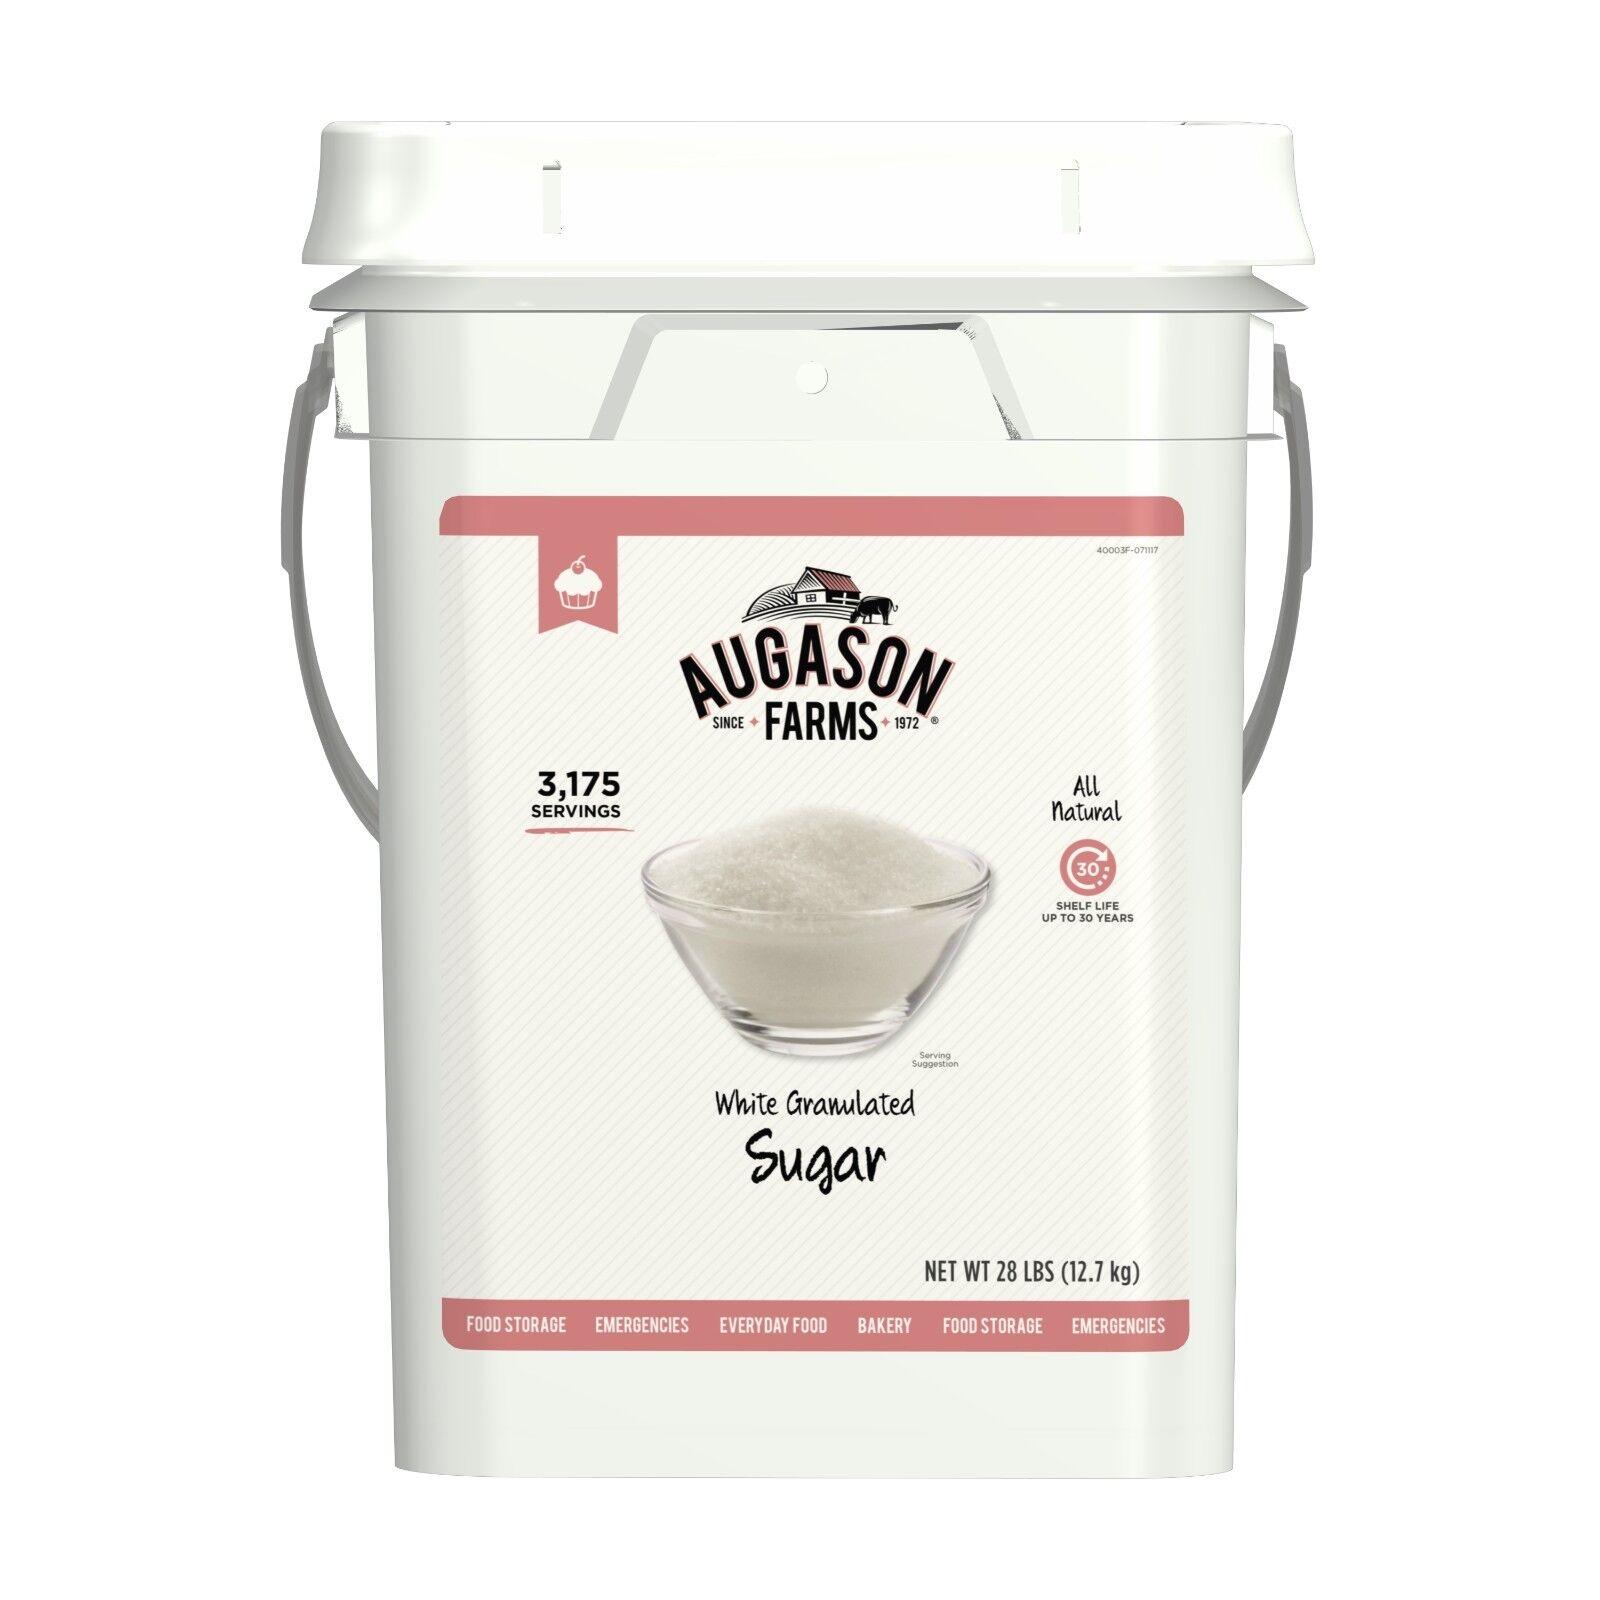 White Granulated Sugar 28lb Camping Emergency Survival Food Storage Gluten Free